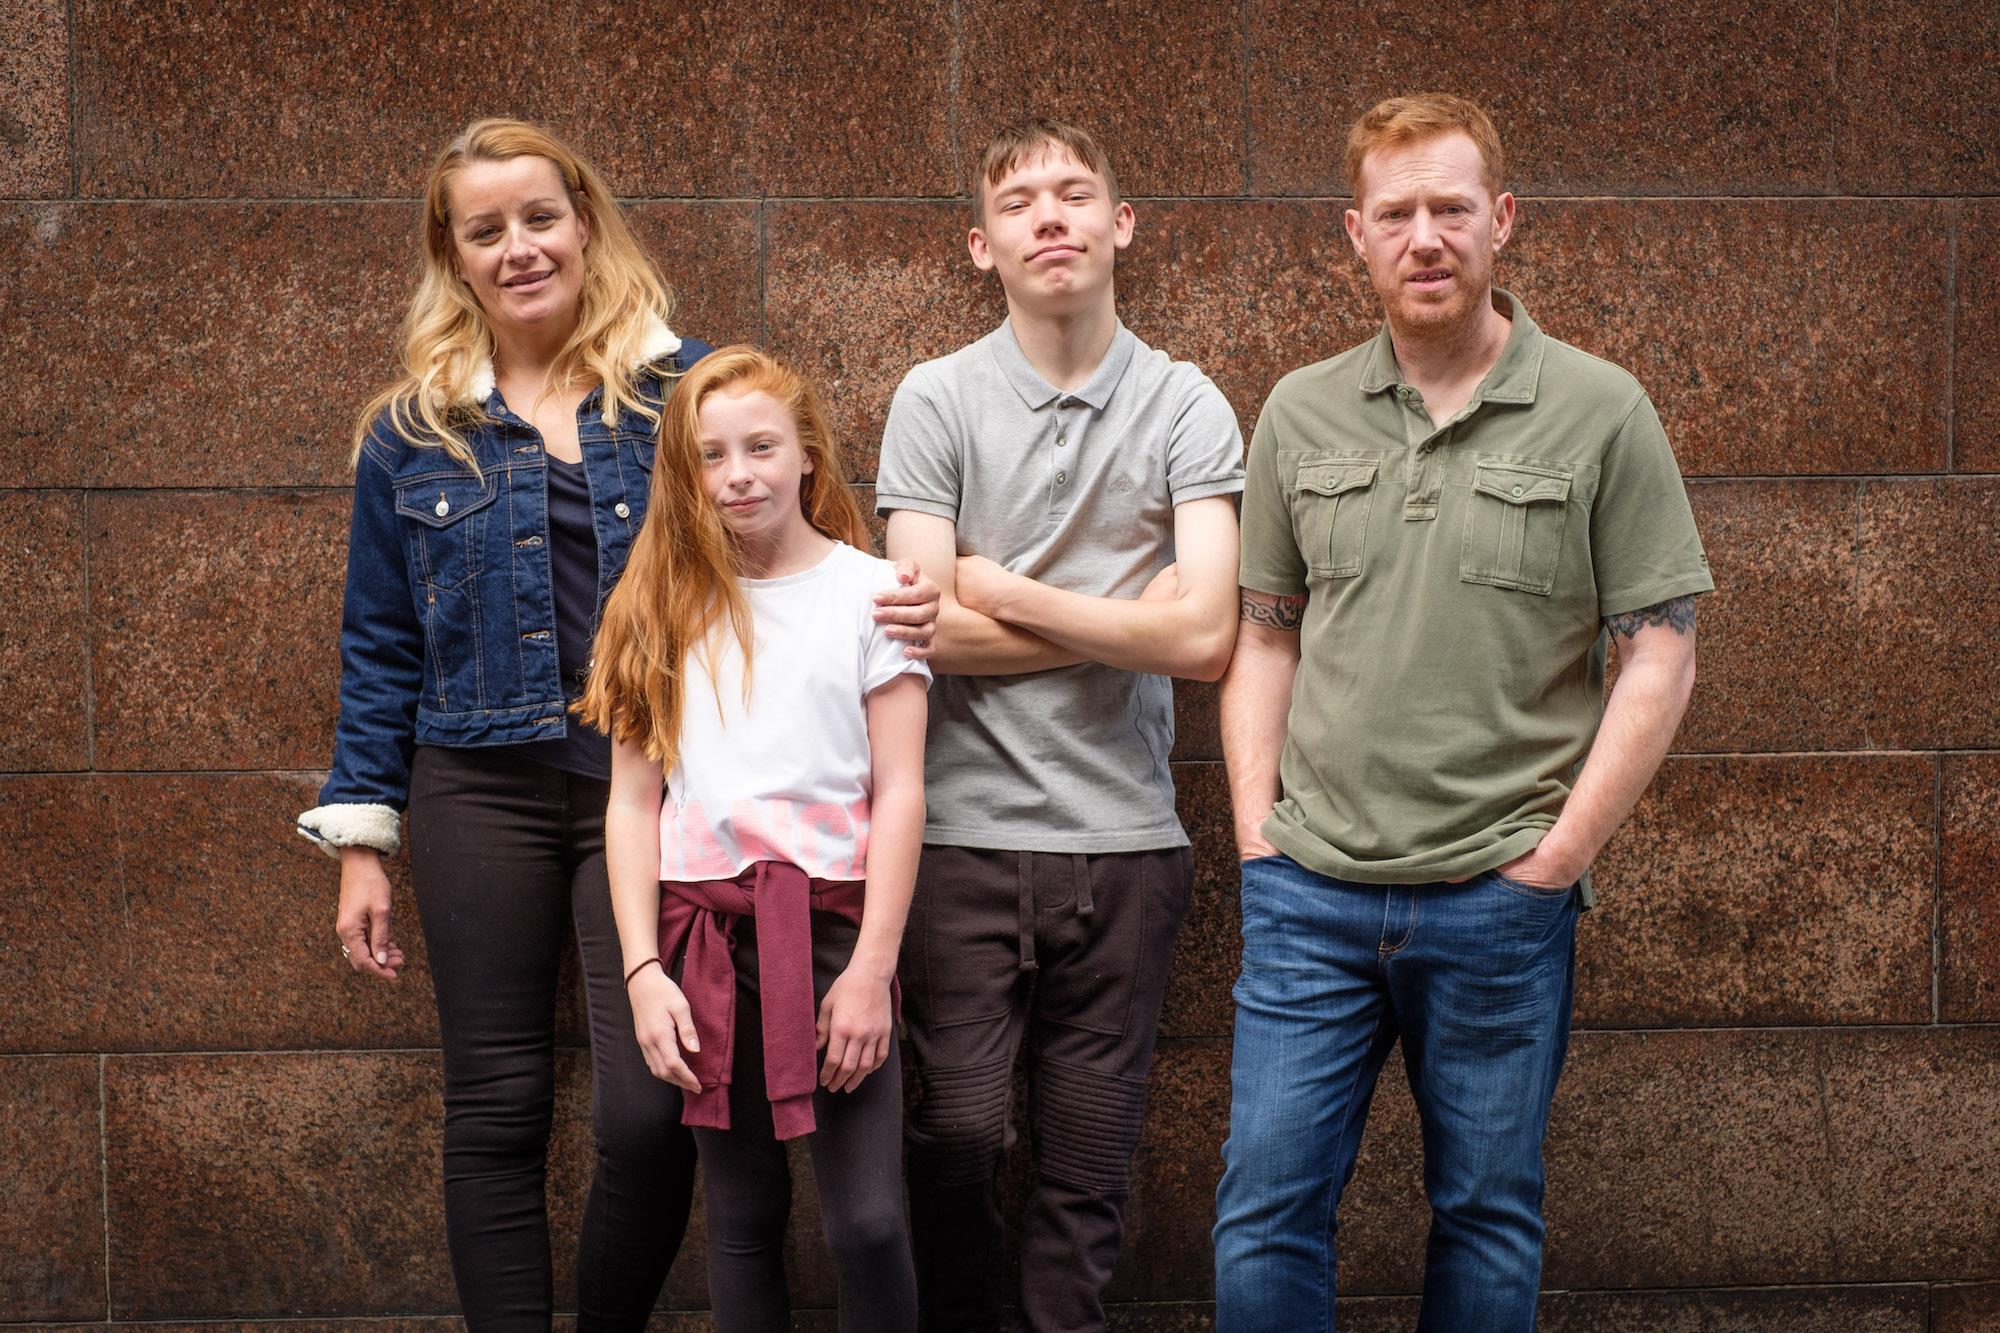 13 UK and Irish films to tempt festival directors in 2019